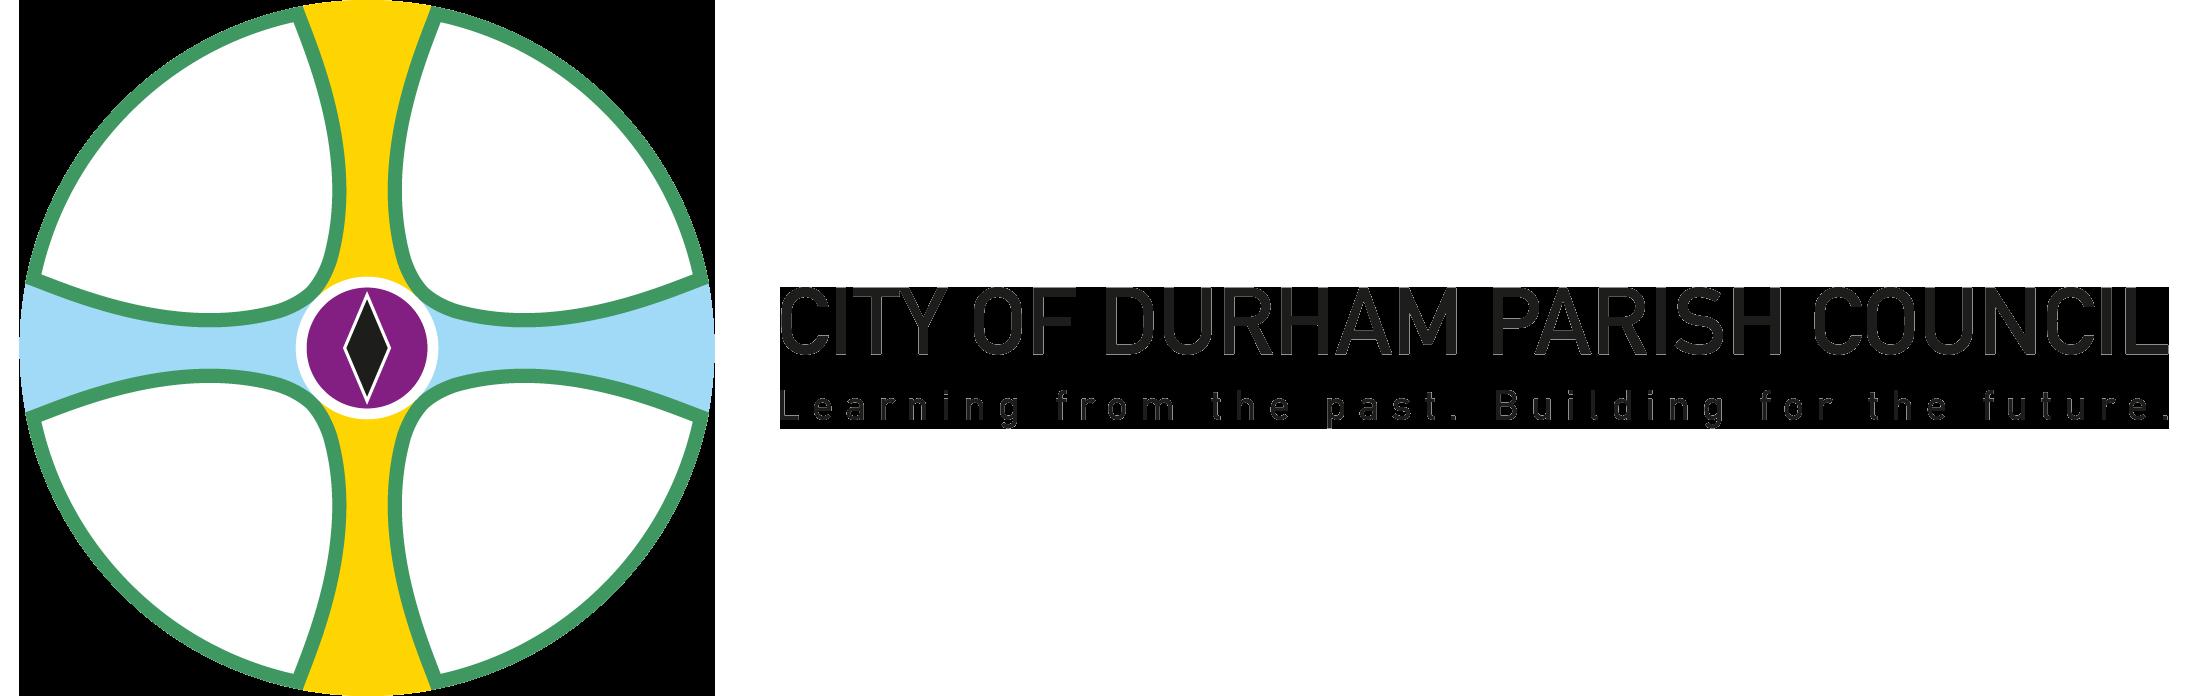 City of Durham Parish Council logo